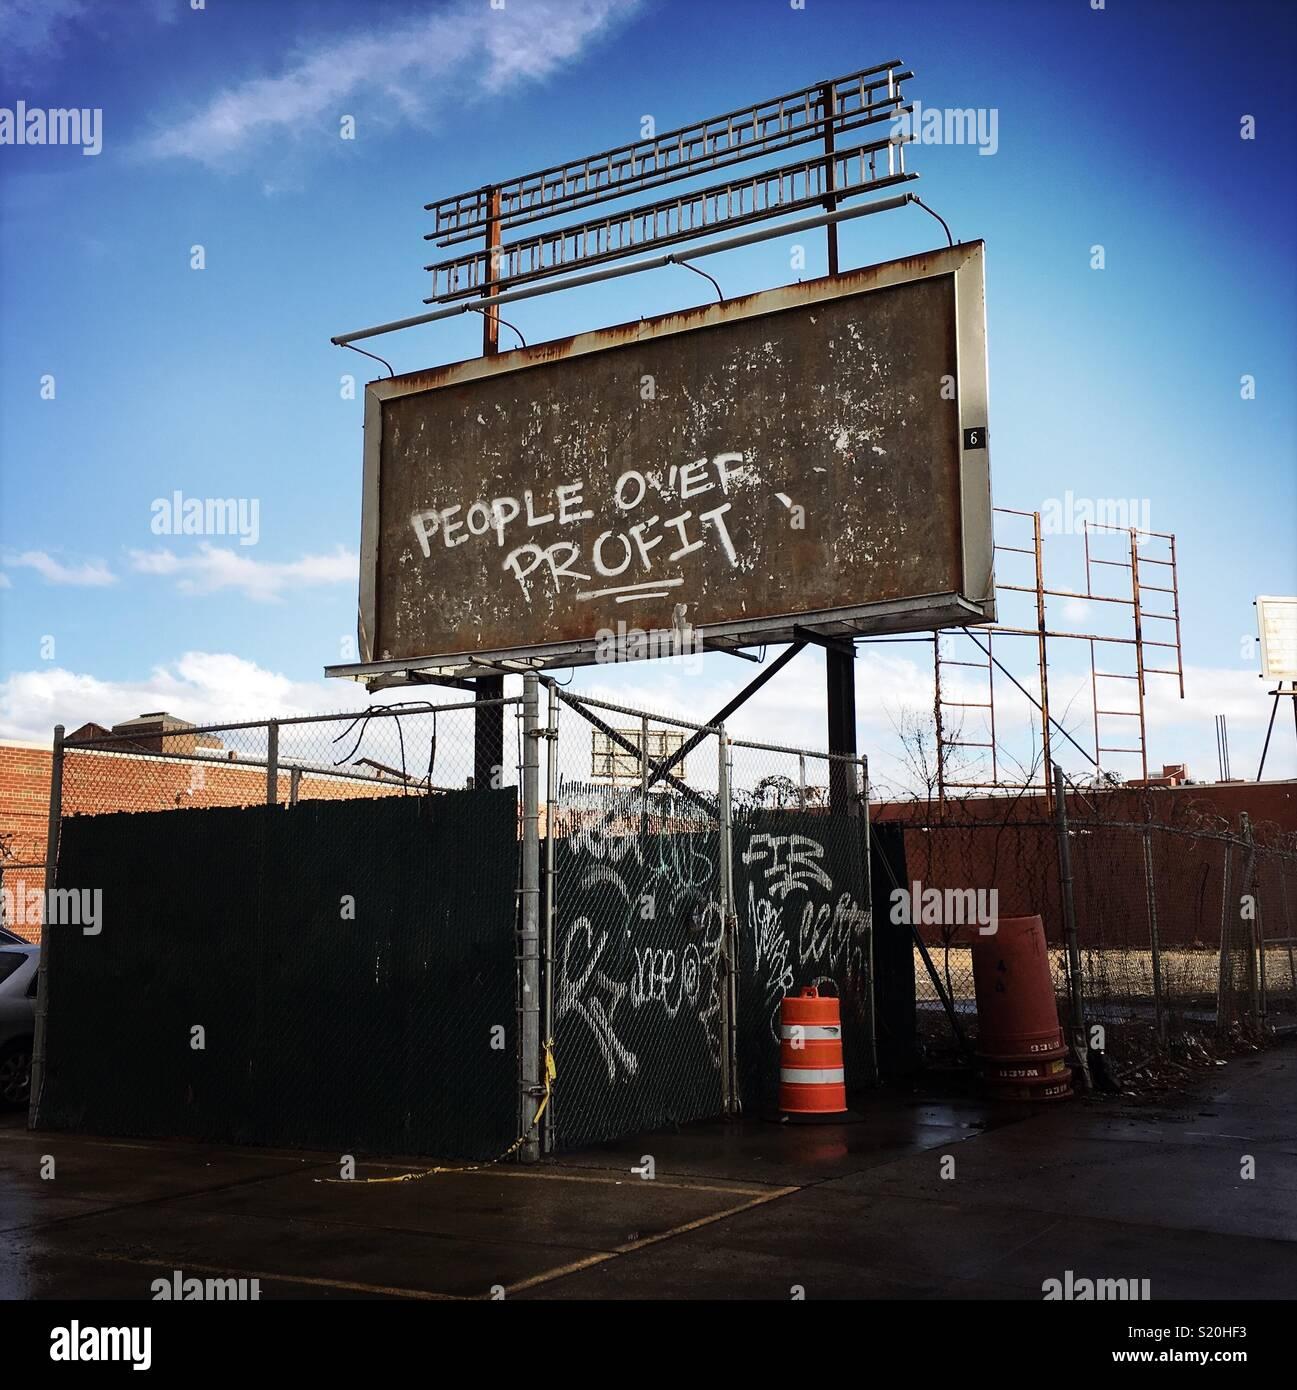 Political message written on billboard - Stock Image